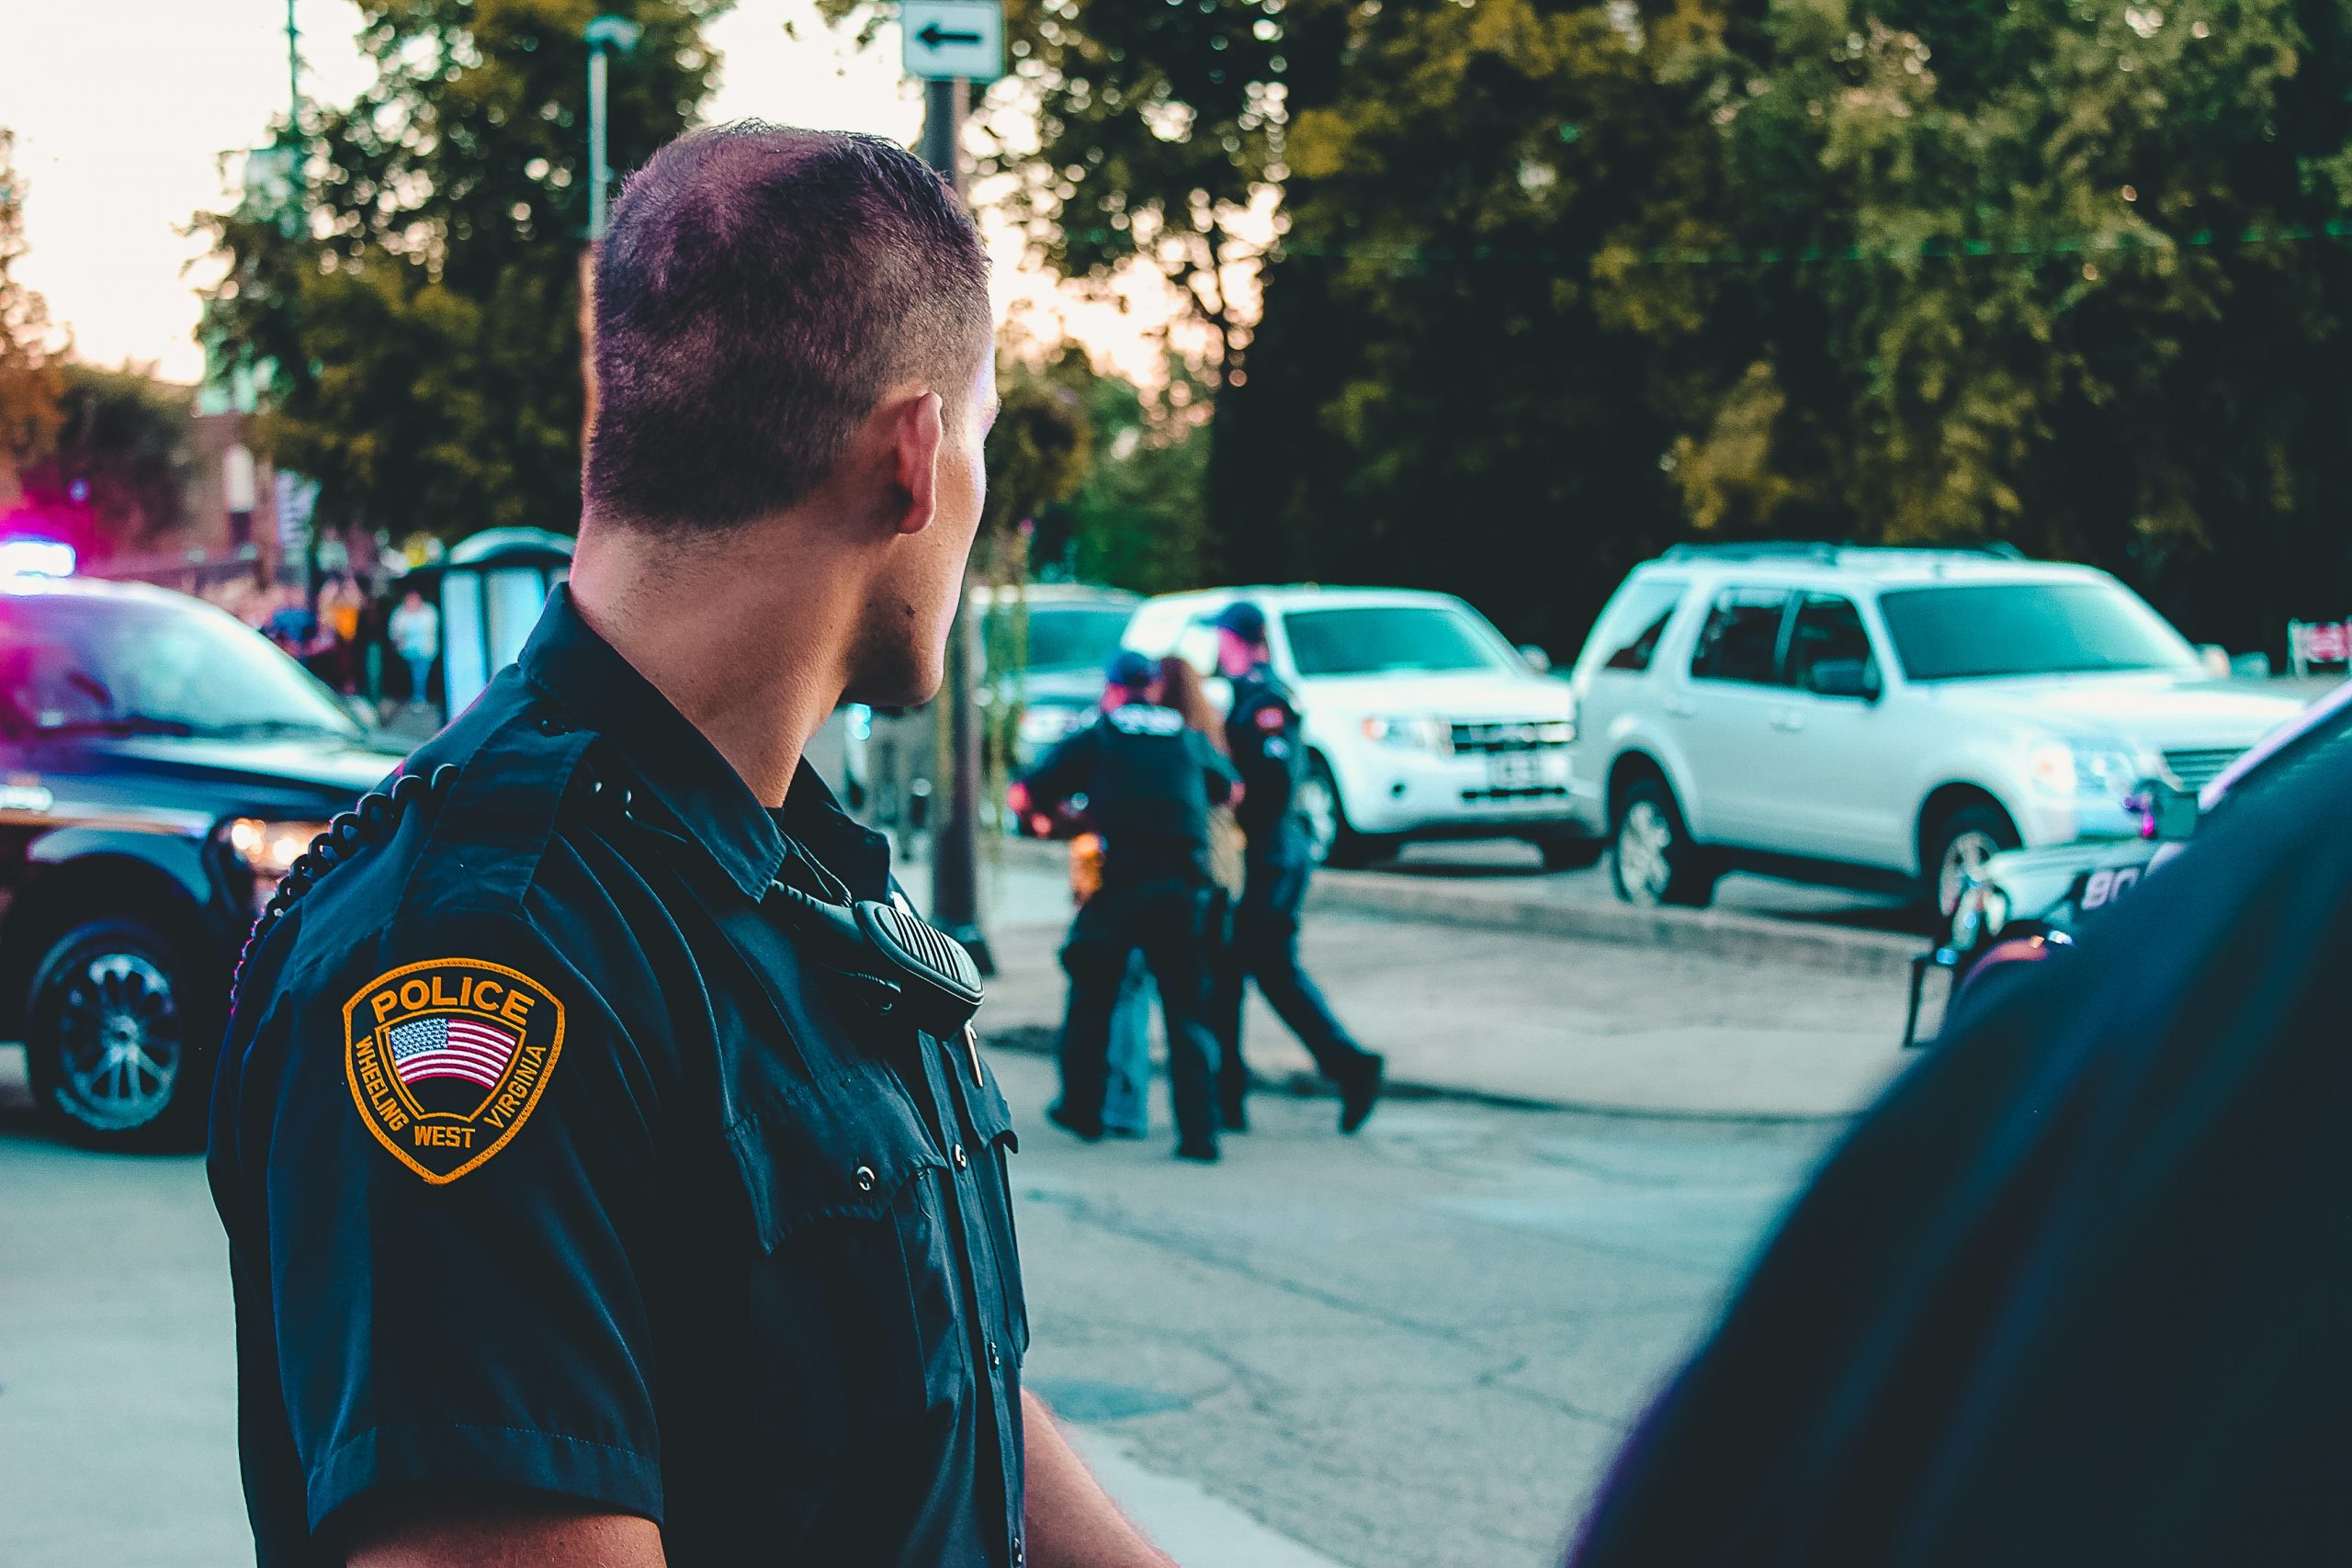 Man Wearing Black Officer Uniform 1464230